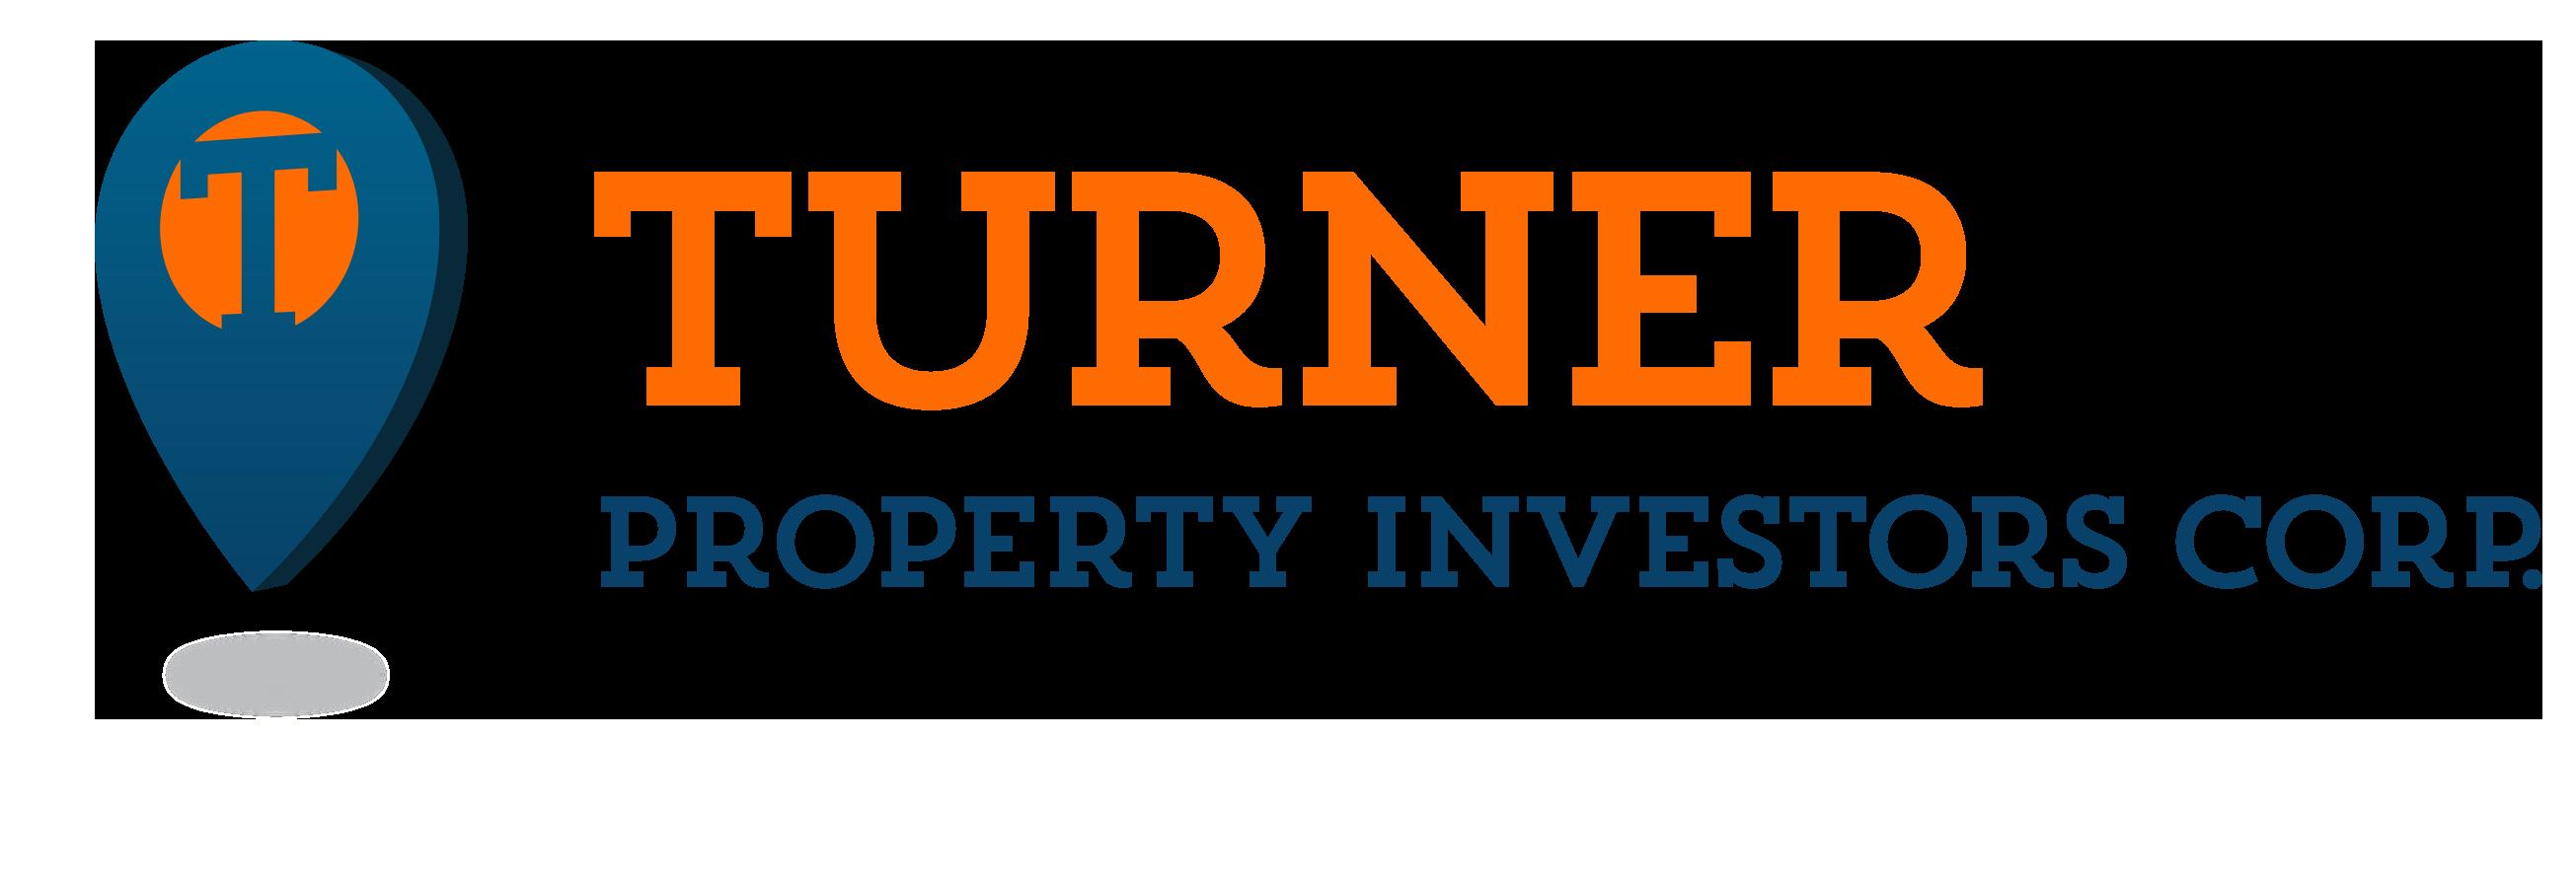 Turner Property Investors Corp.